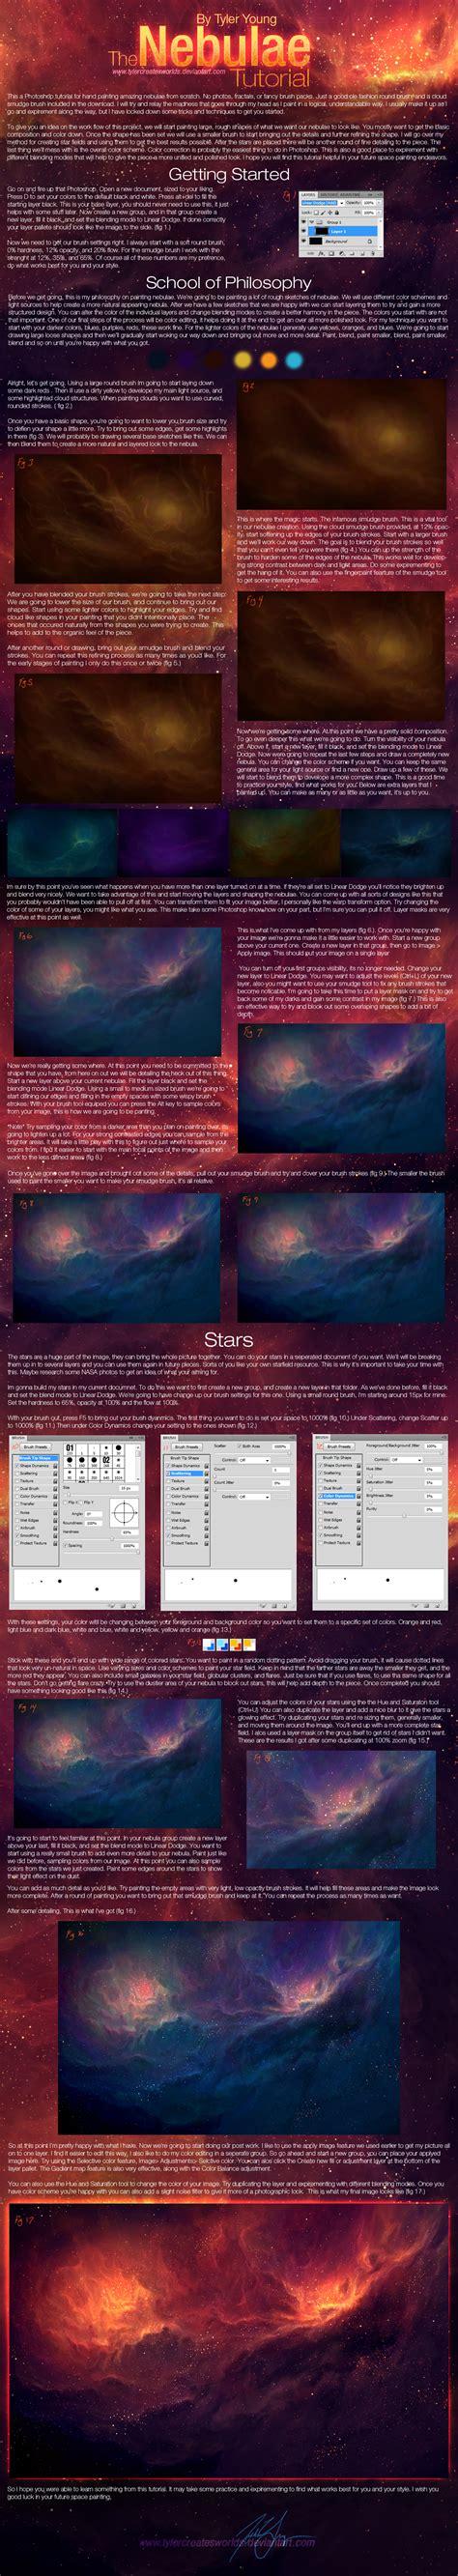 nebula pattern photoshop download nebulae tutorial by tylercreatesworlds on deviantart